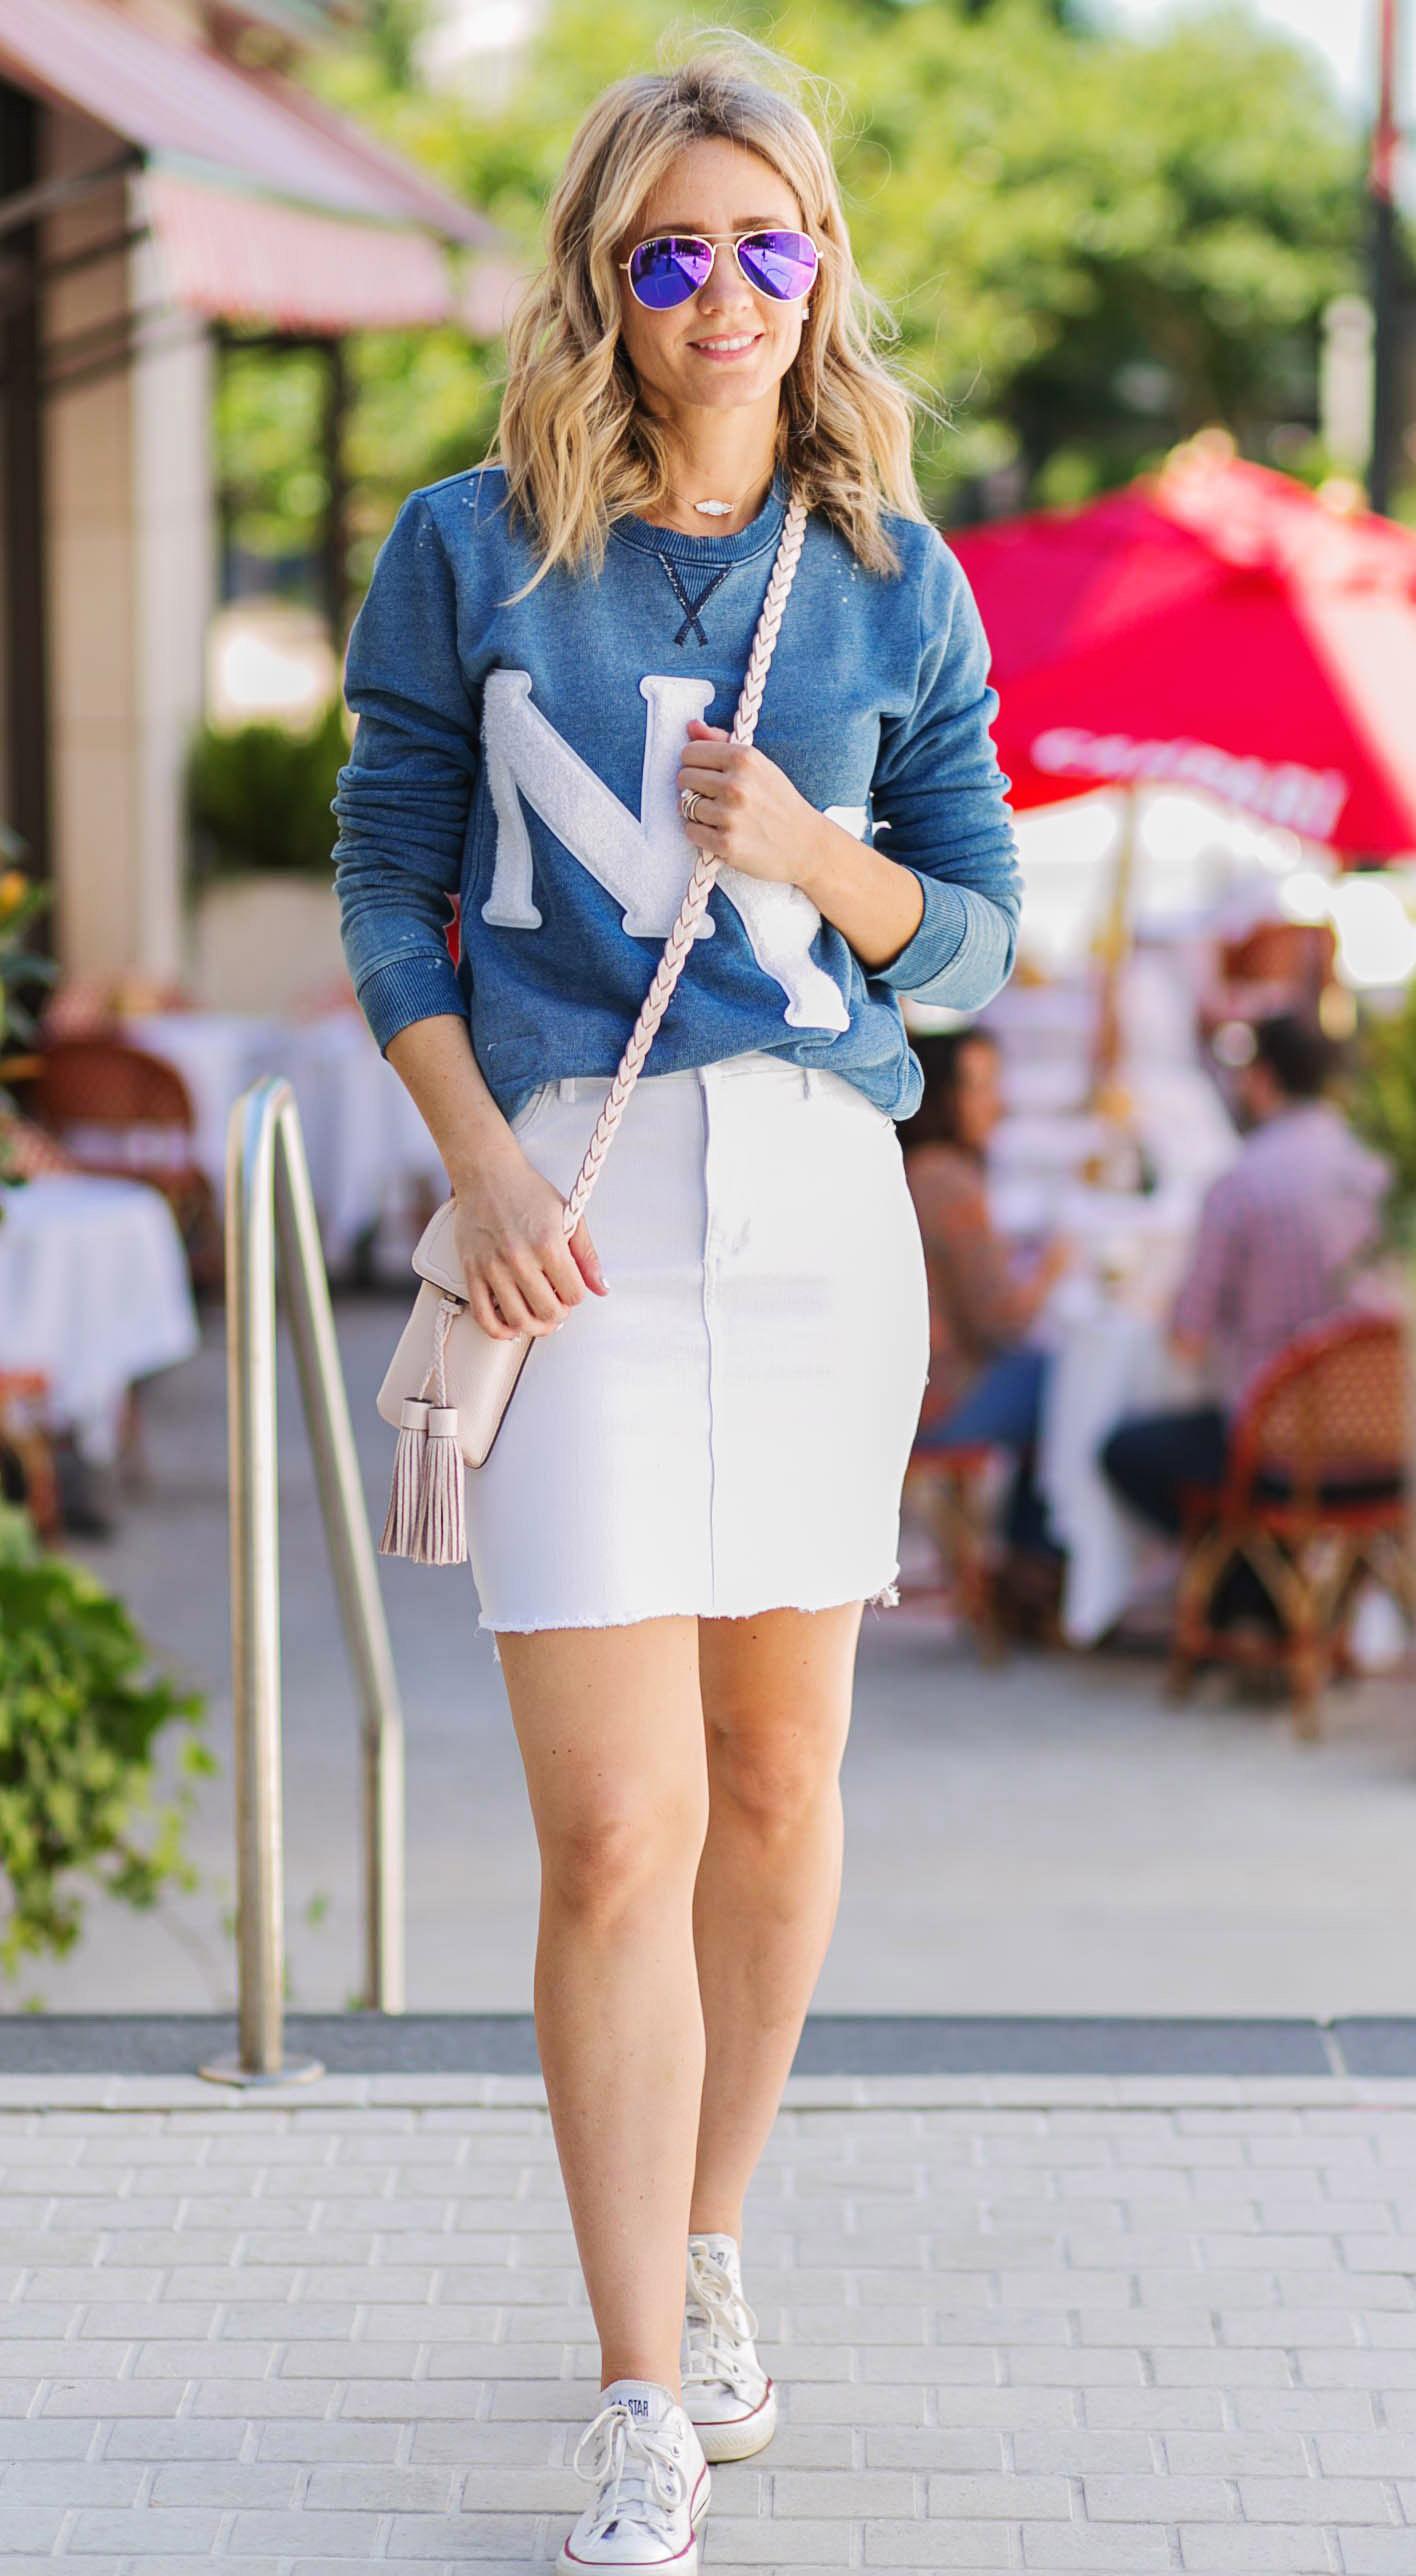 white-mini-skirt-blue-med-sweater-sweatshirt-white-bag-blonde-sun-white-shoe-sneakers-spring-summer-weekend.jpg